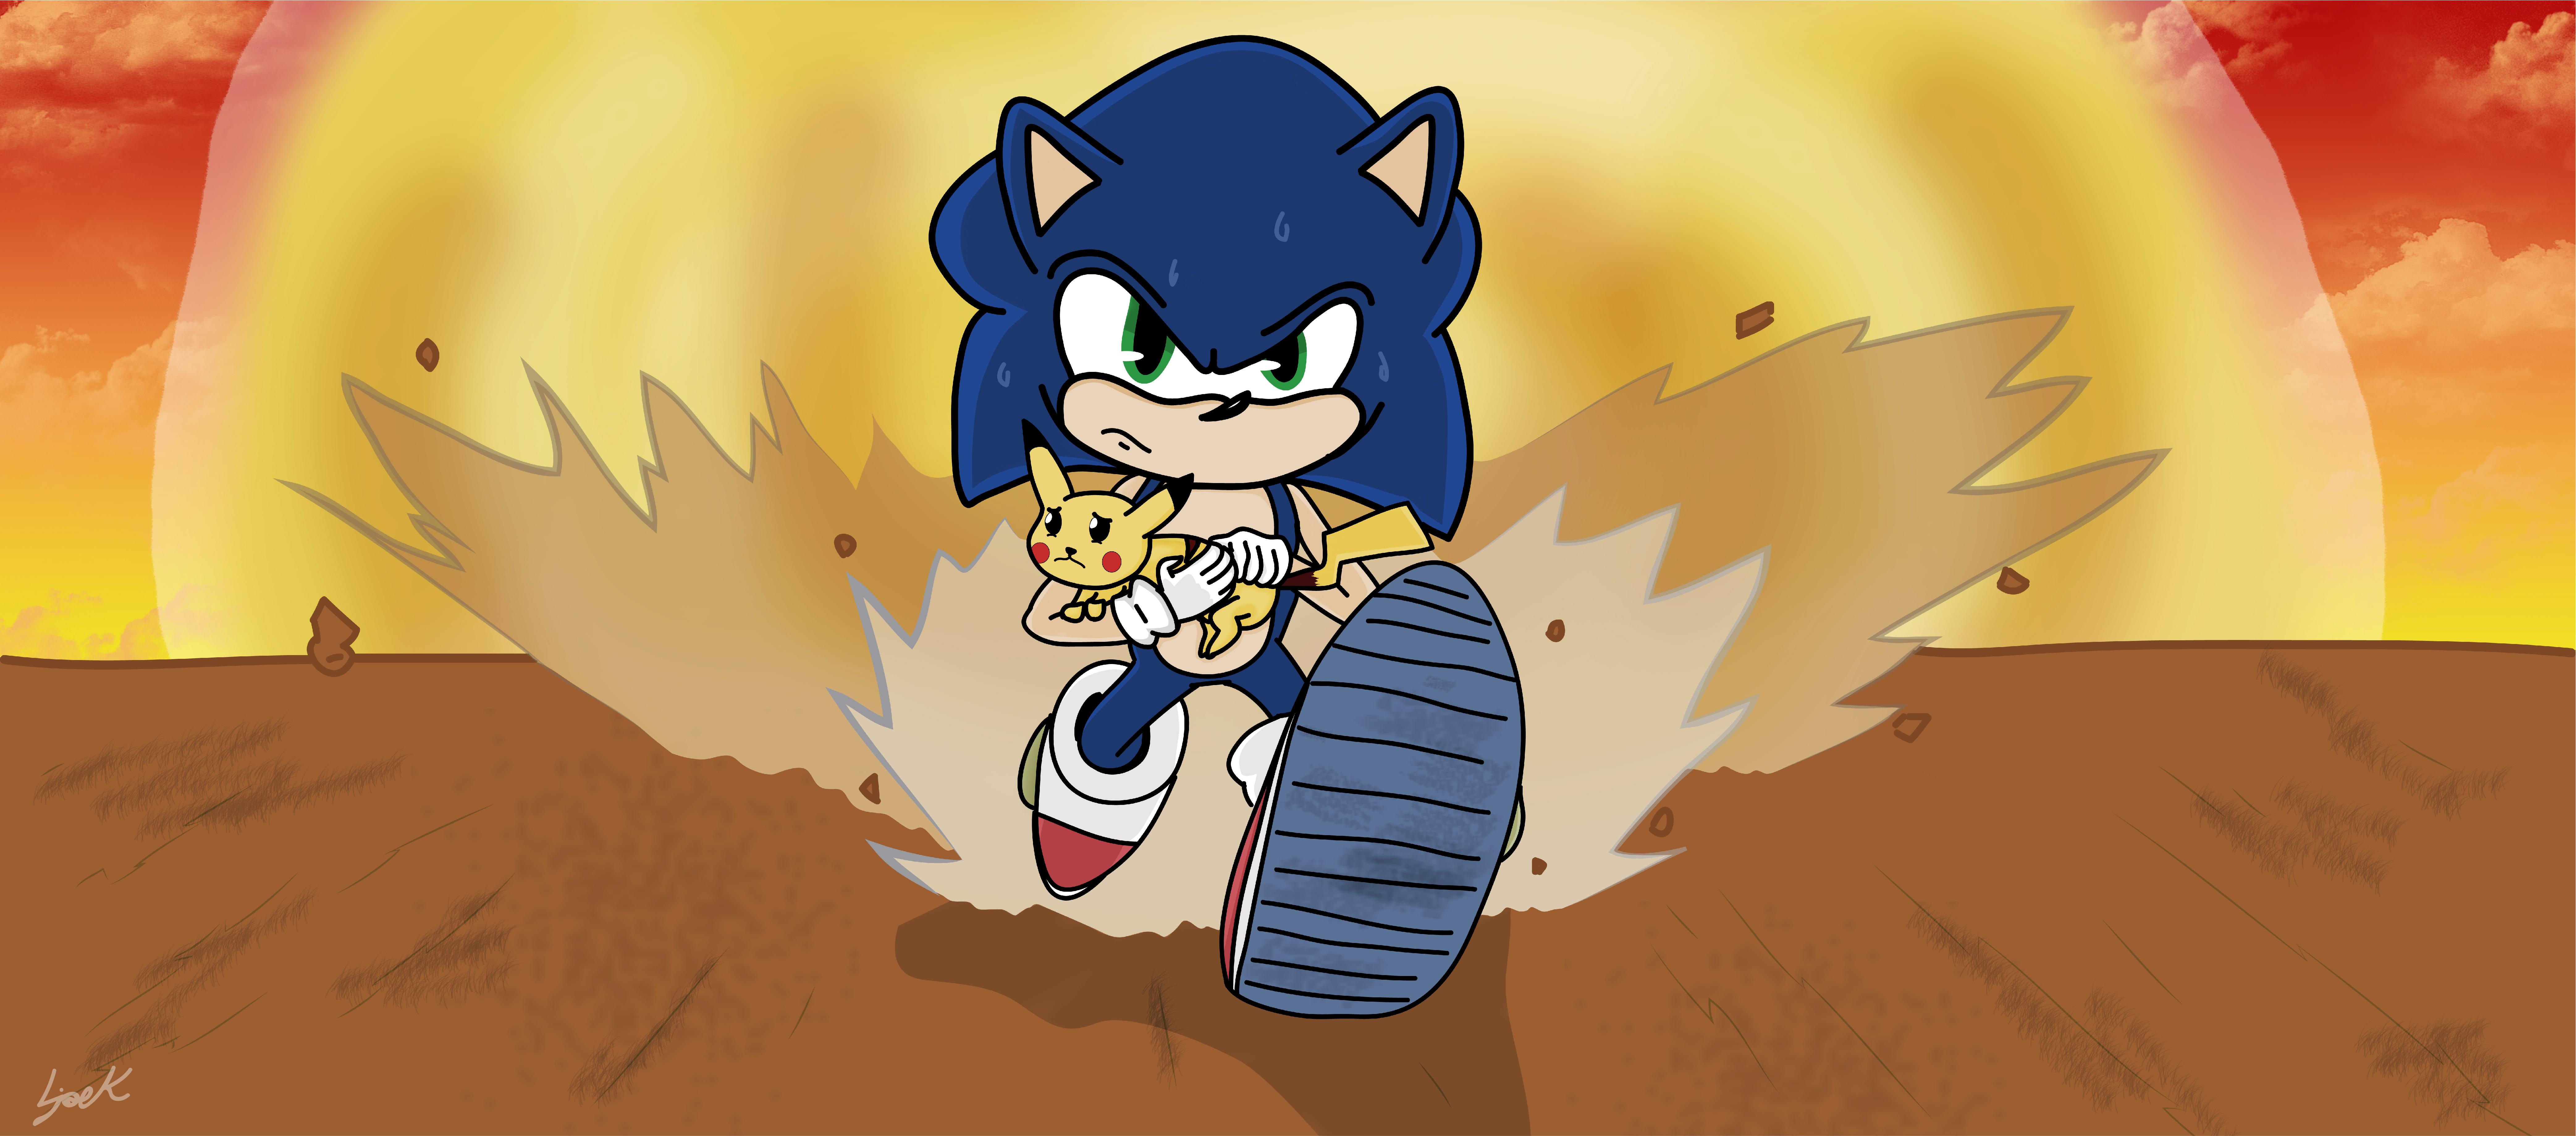 Super Smash Bros Ultimate Sonic Pikachu By Soniek99 On